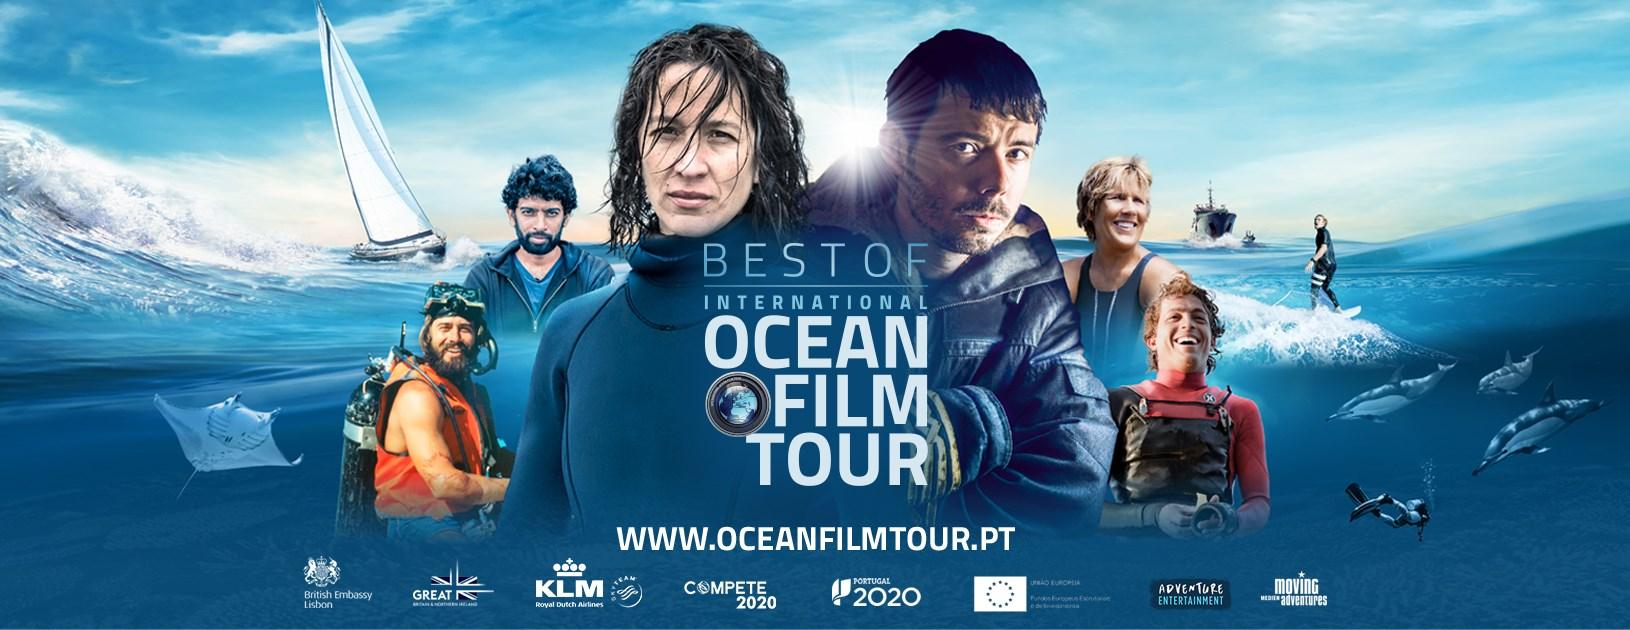 International Ocean Film Tour Best of - Nazaré